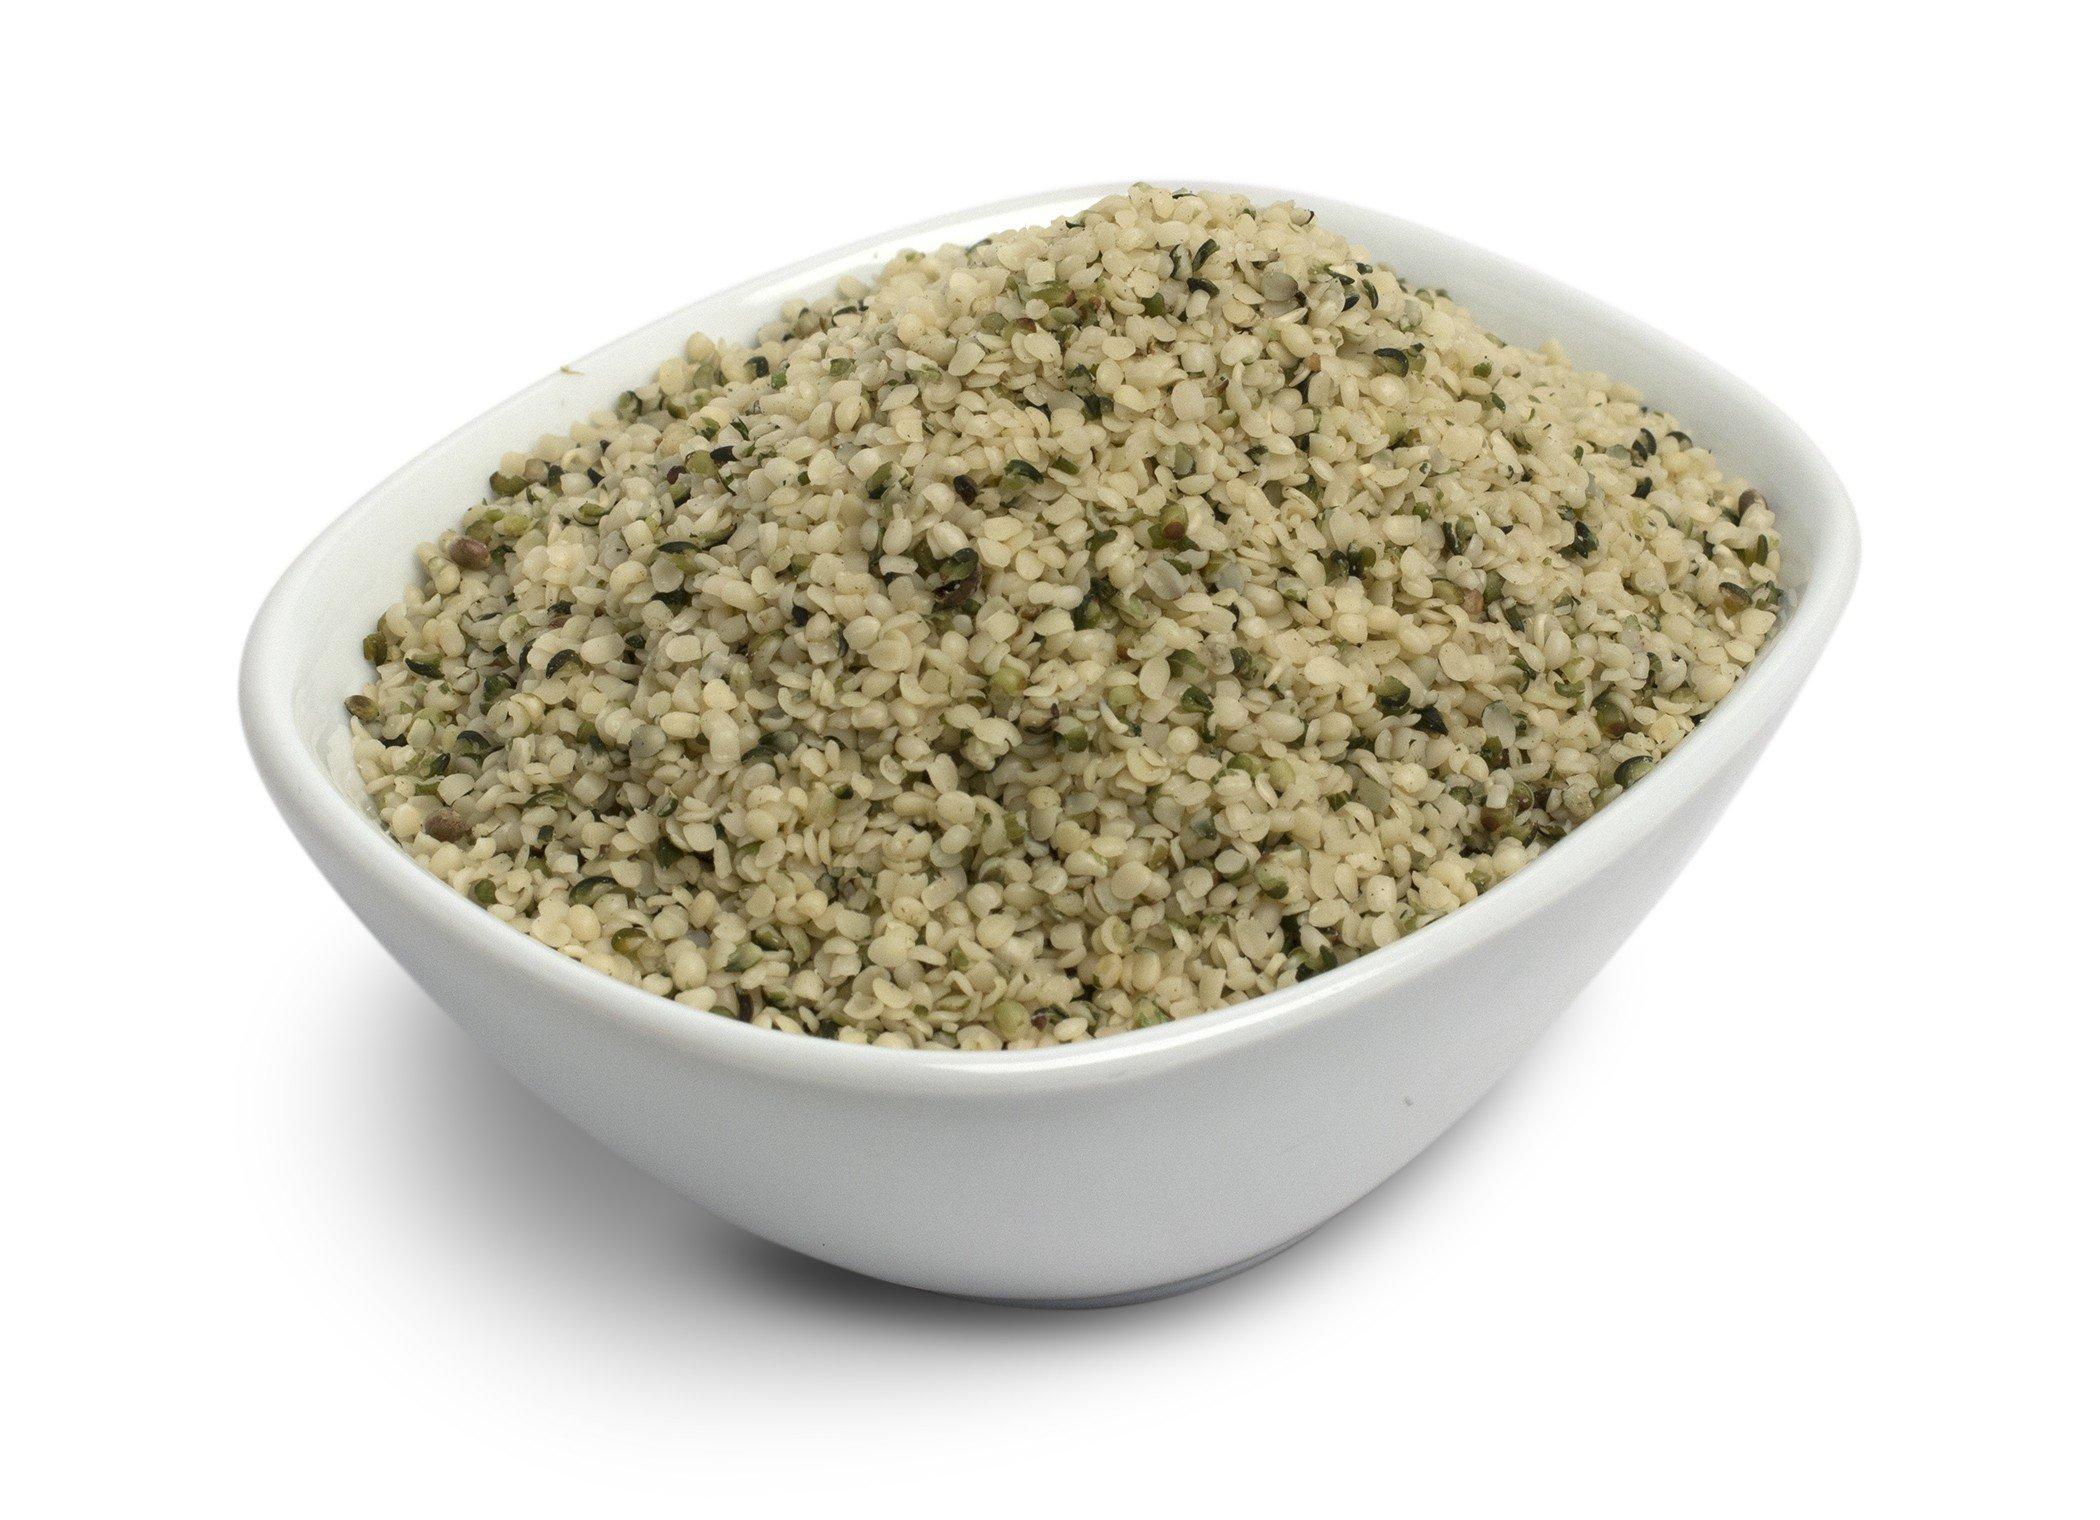 Sunfood Hemp Seeds, Shelled, 1lb, Organic, Raw by Sunfood (Image #4)